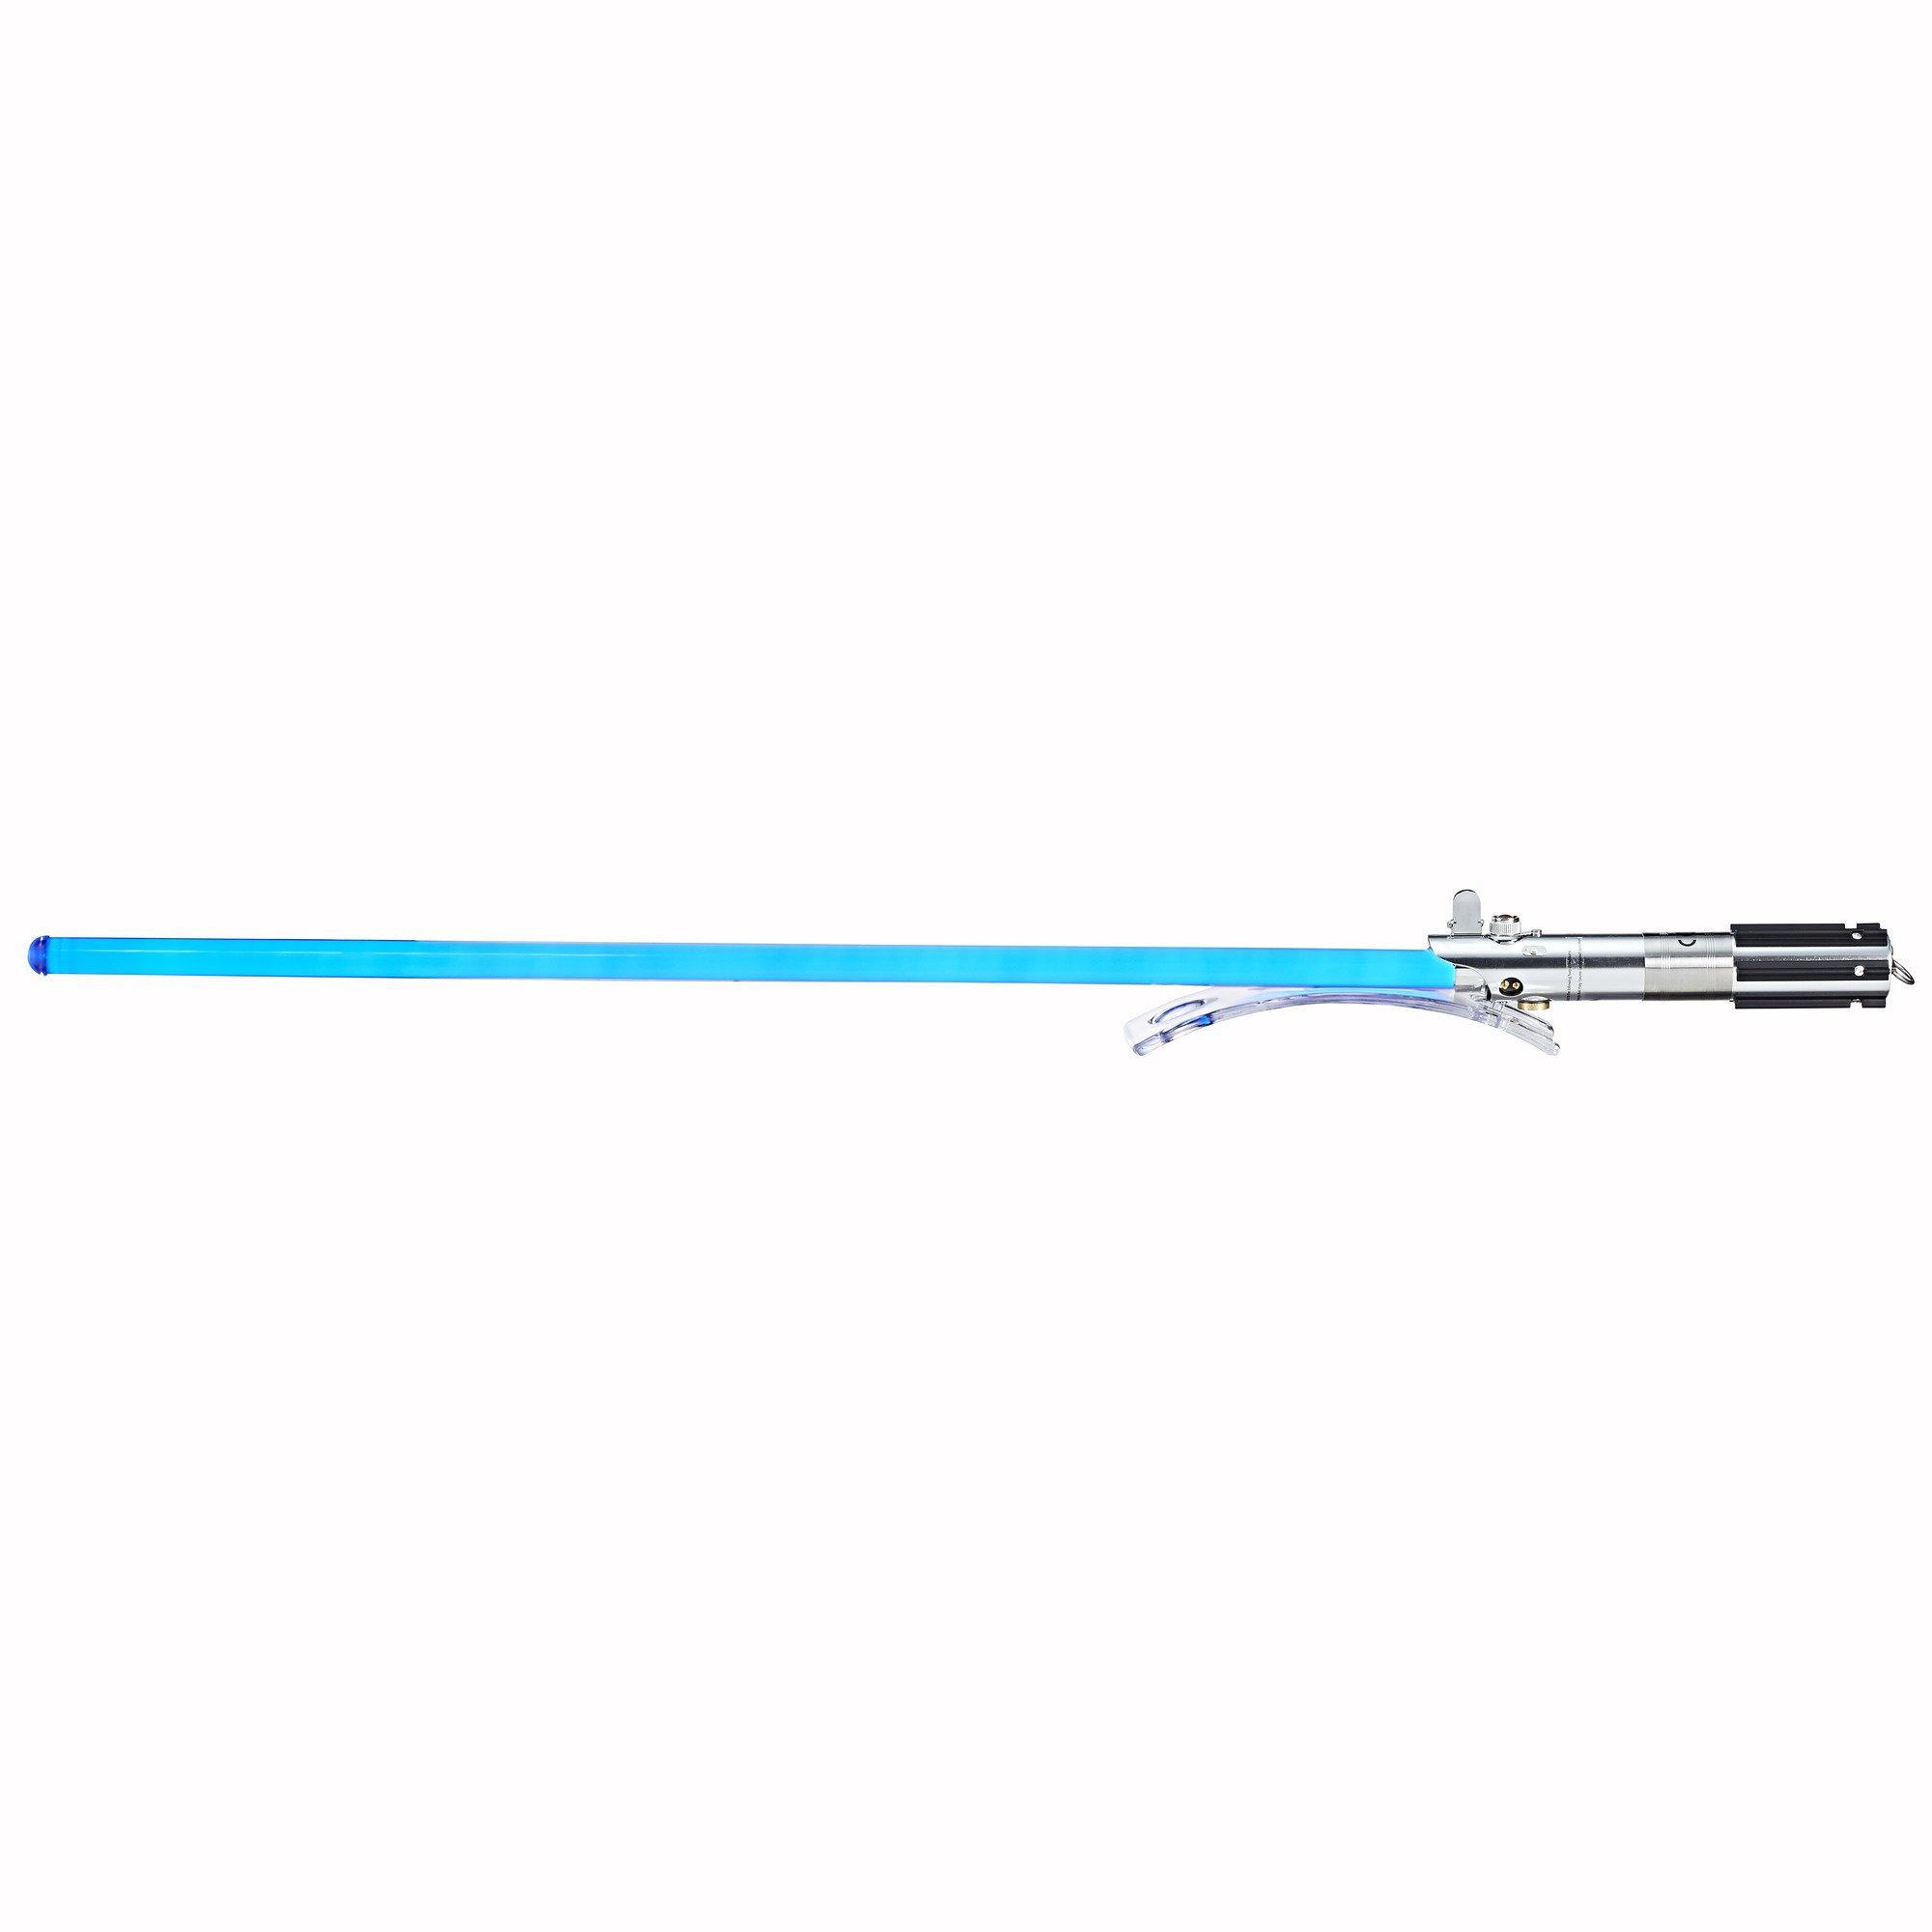 Star Wars: The Last Jedi The Black Series Rey (Jedi Training) Force FX Lightsaber by Star Wars (Image #4)